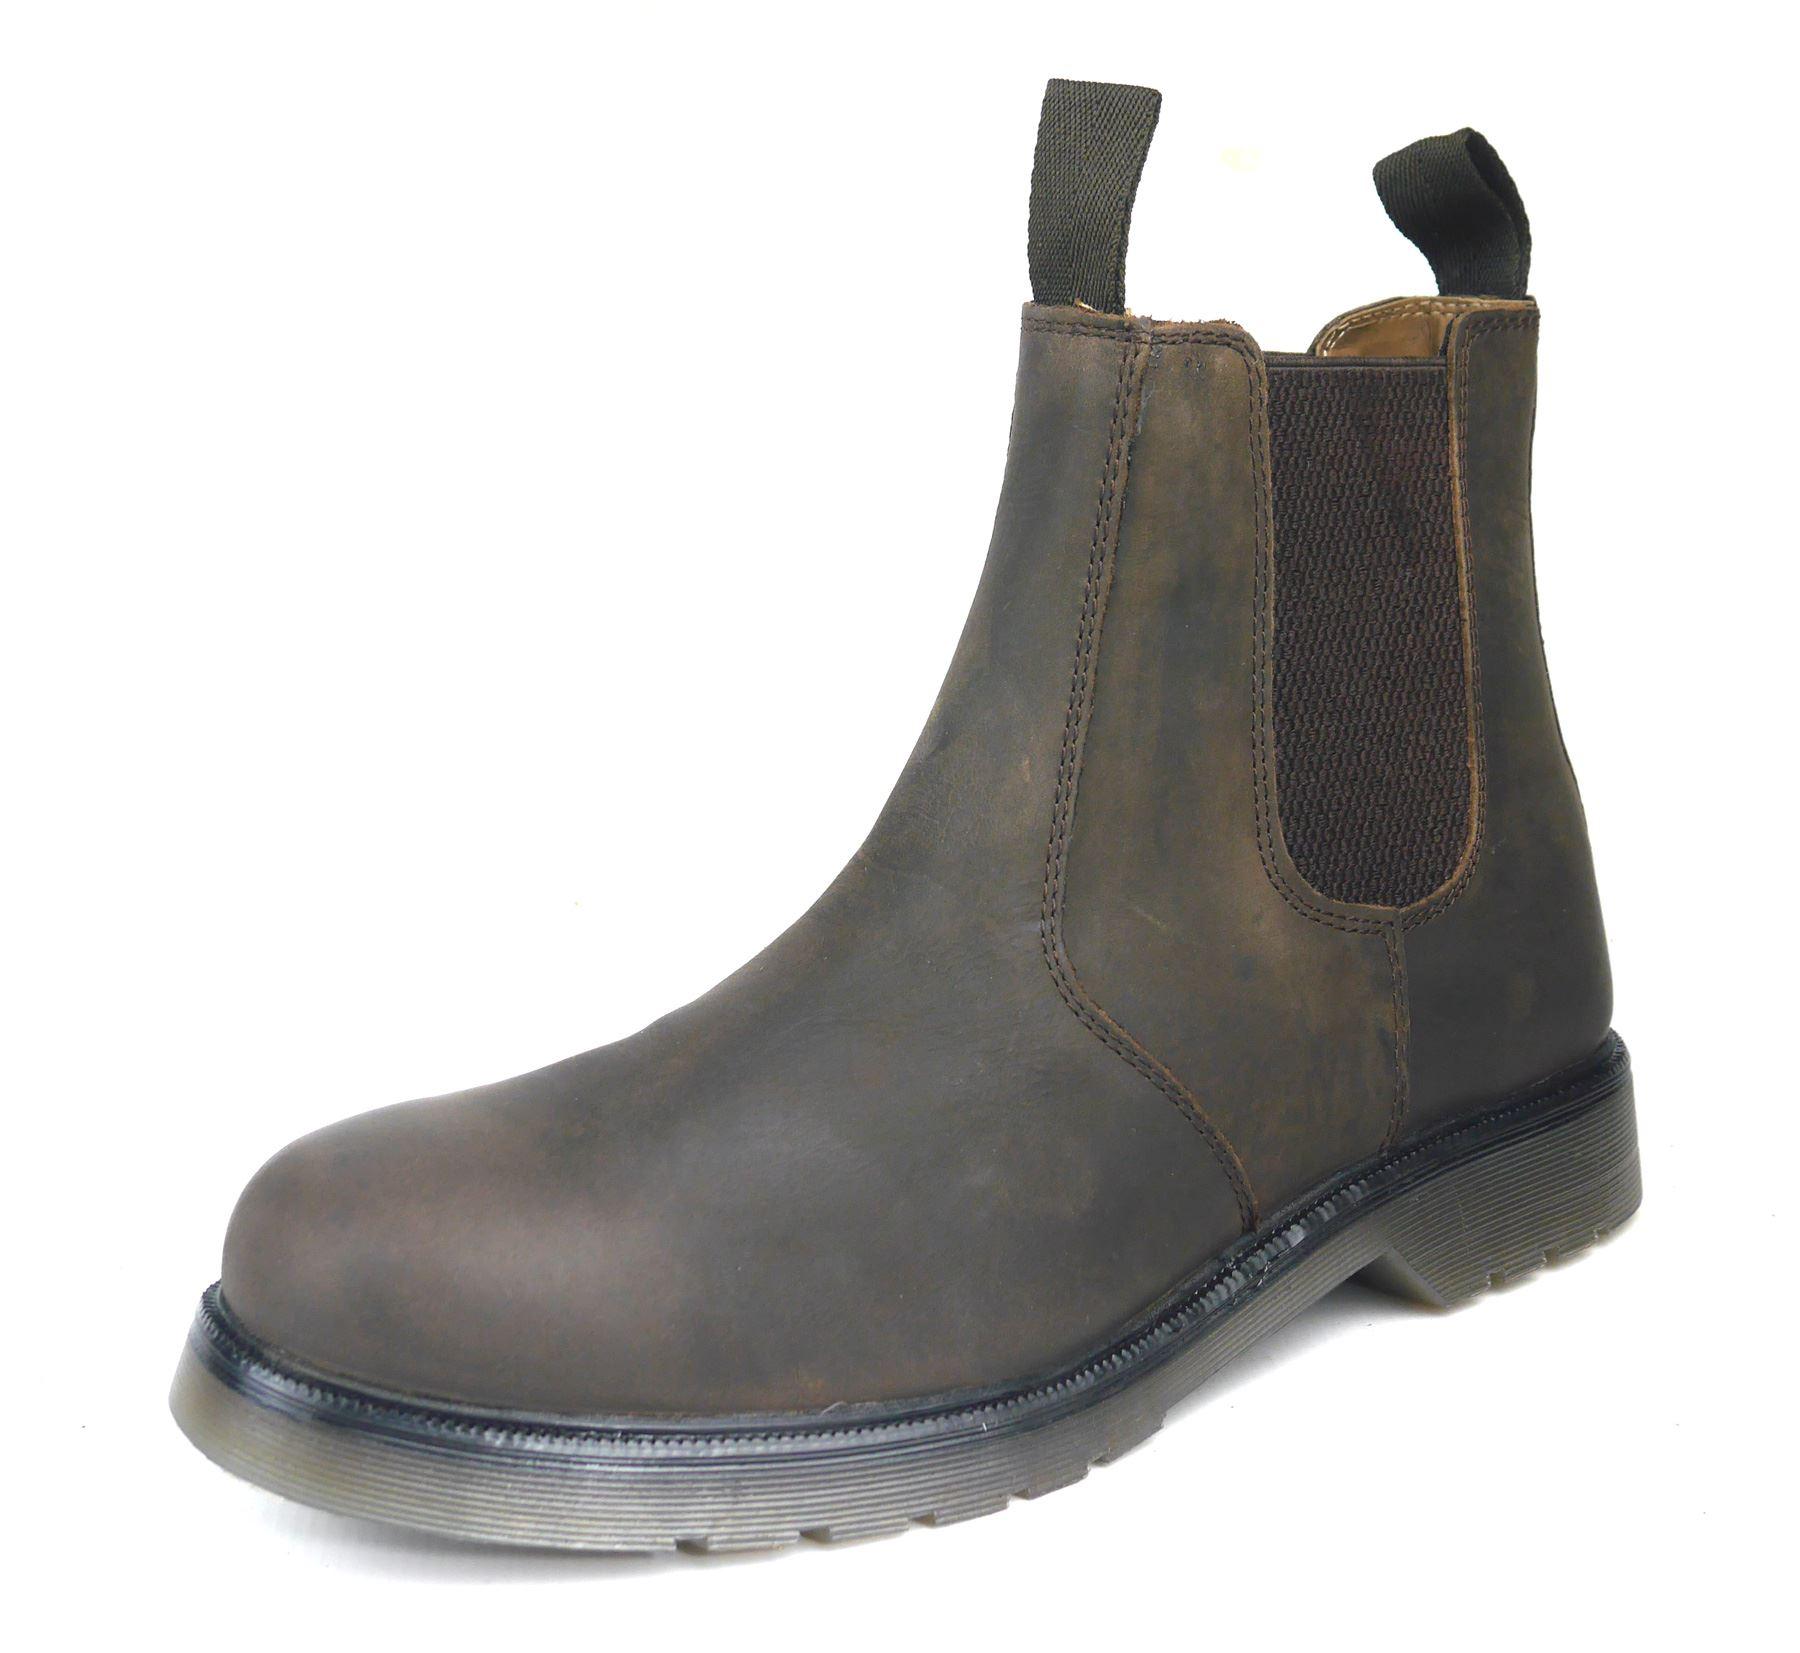 pelle Goodwood Chelsea Uomo Chocolate marrone Boots Airsole in James Frank Dealer wAqpIw